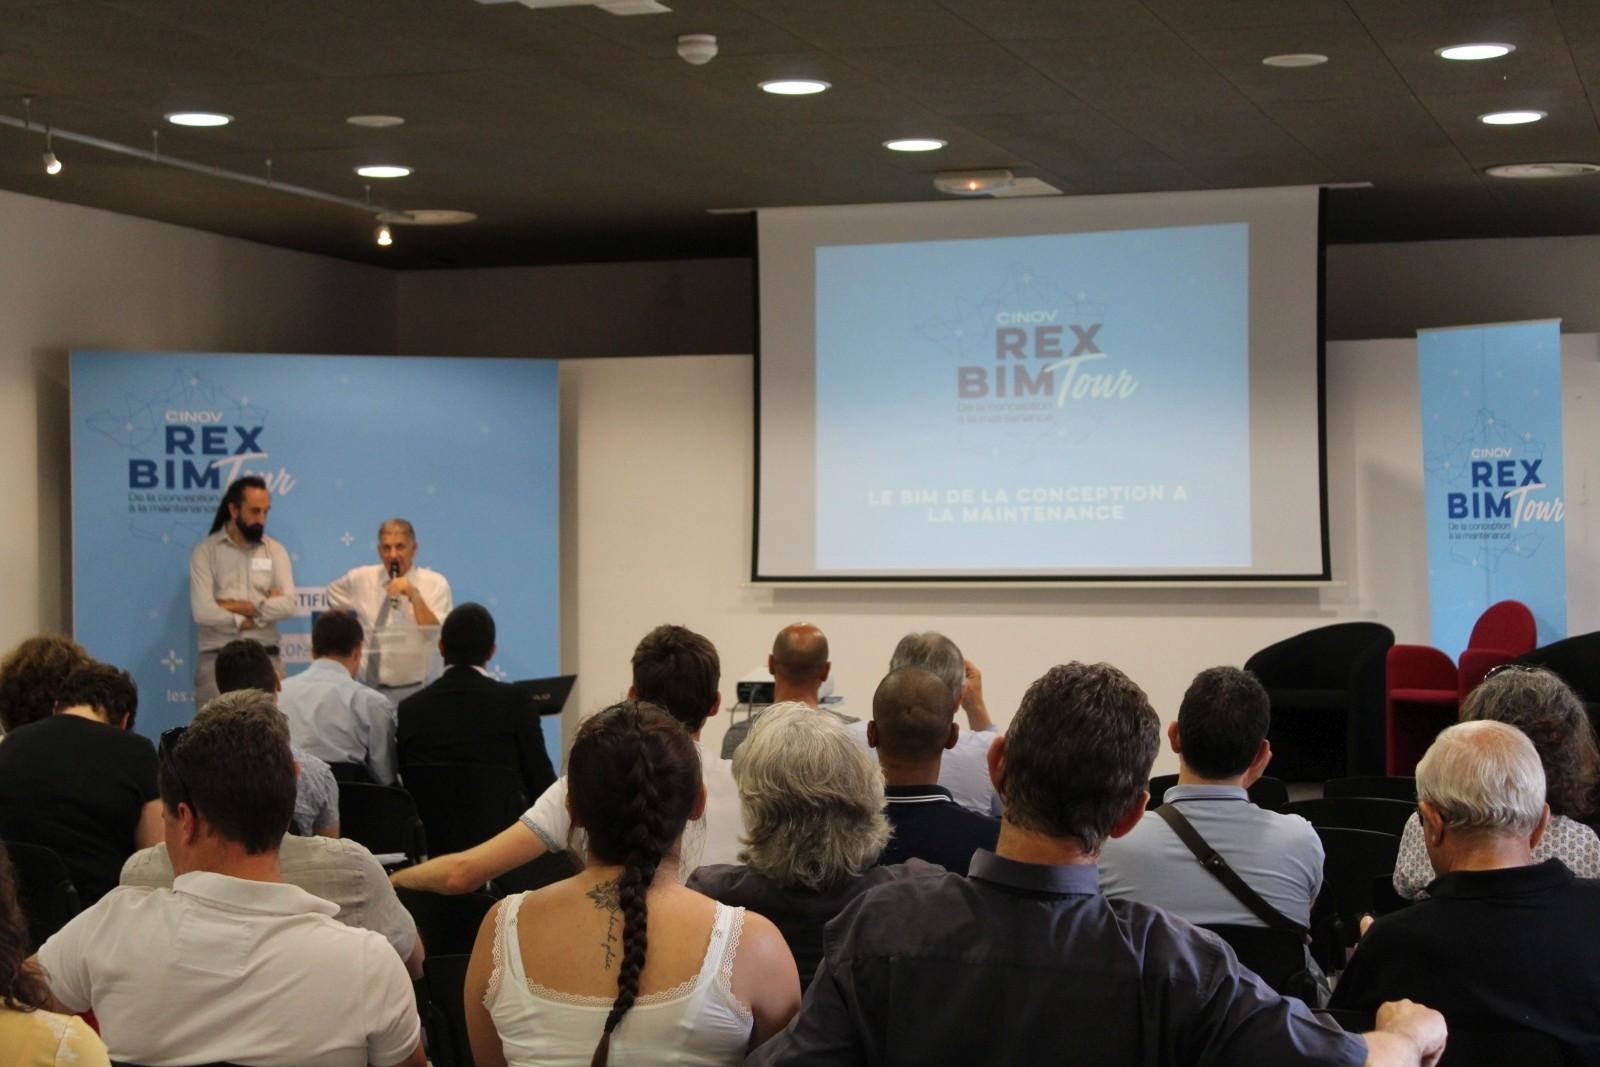 Le REX BIM Tour 2019 en quelques photos - Fédération CINOV